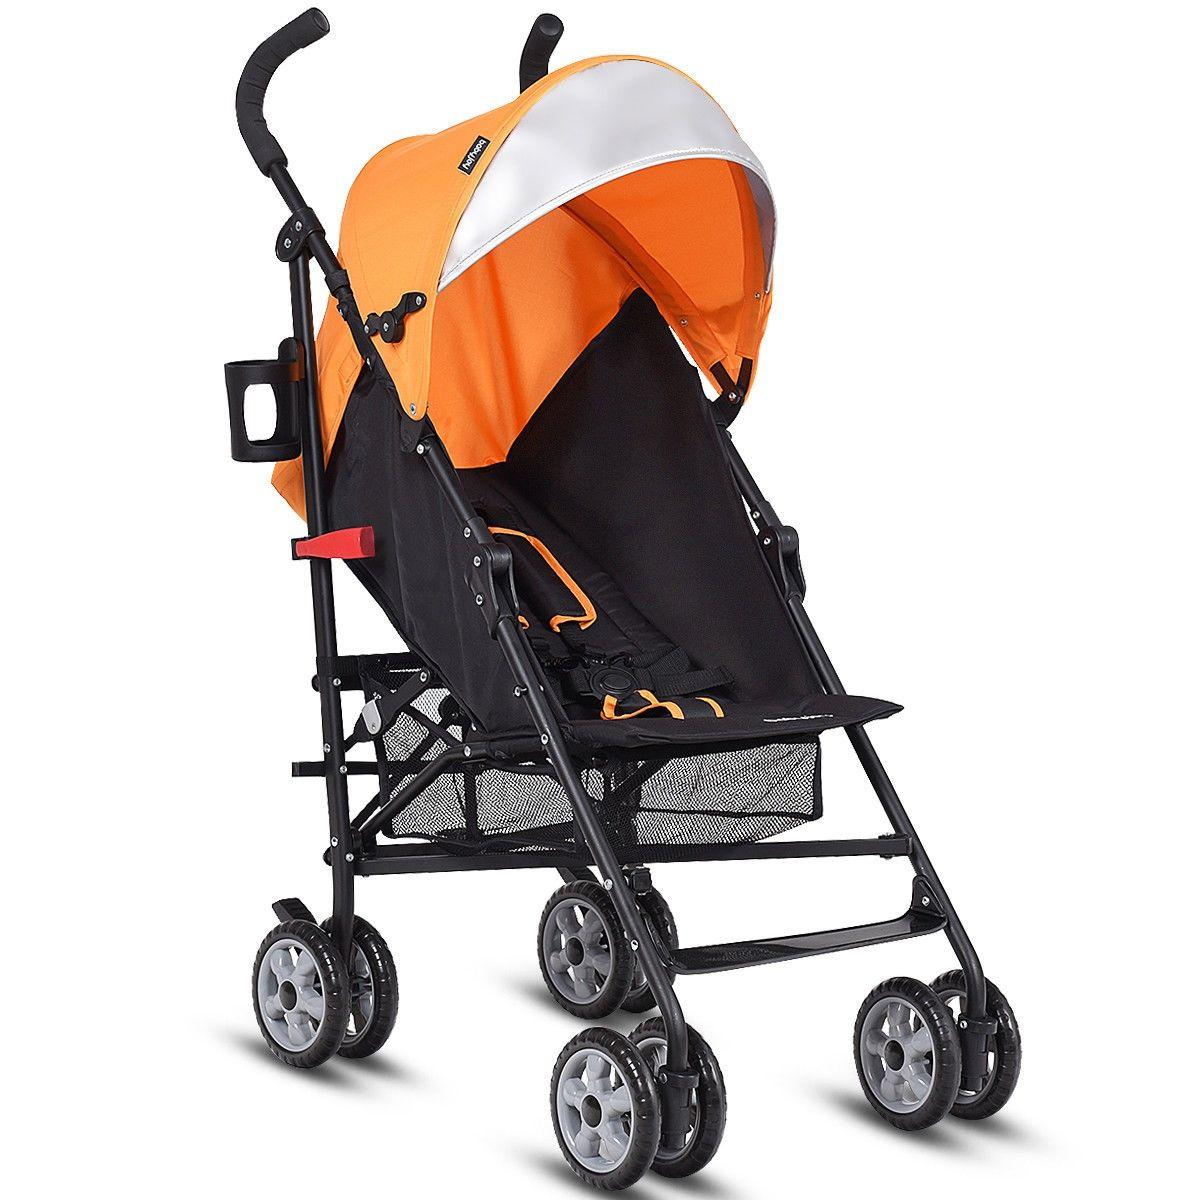 Folding Lightweight Baby Toddler Umbrella Travel Stroller